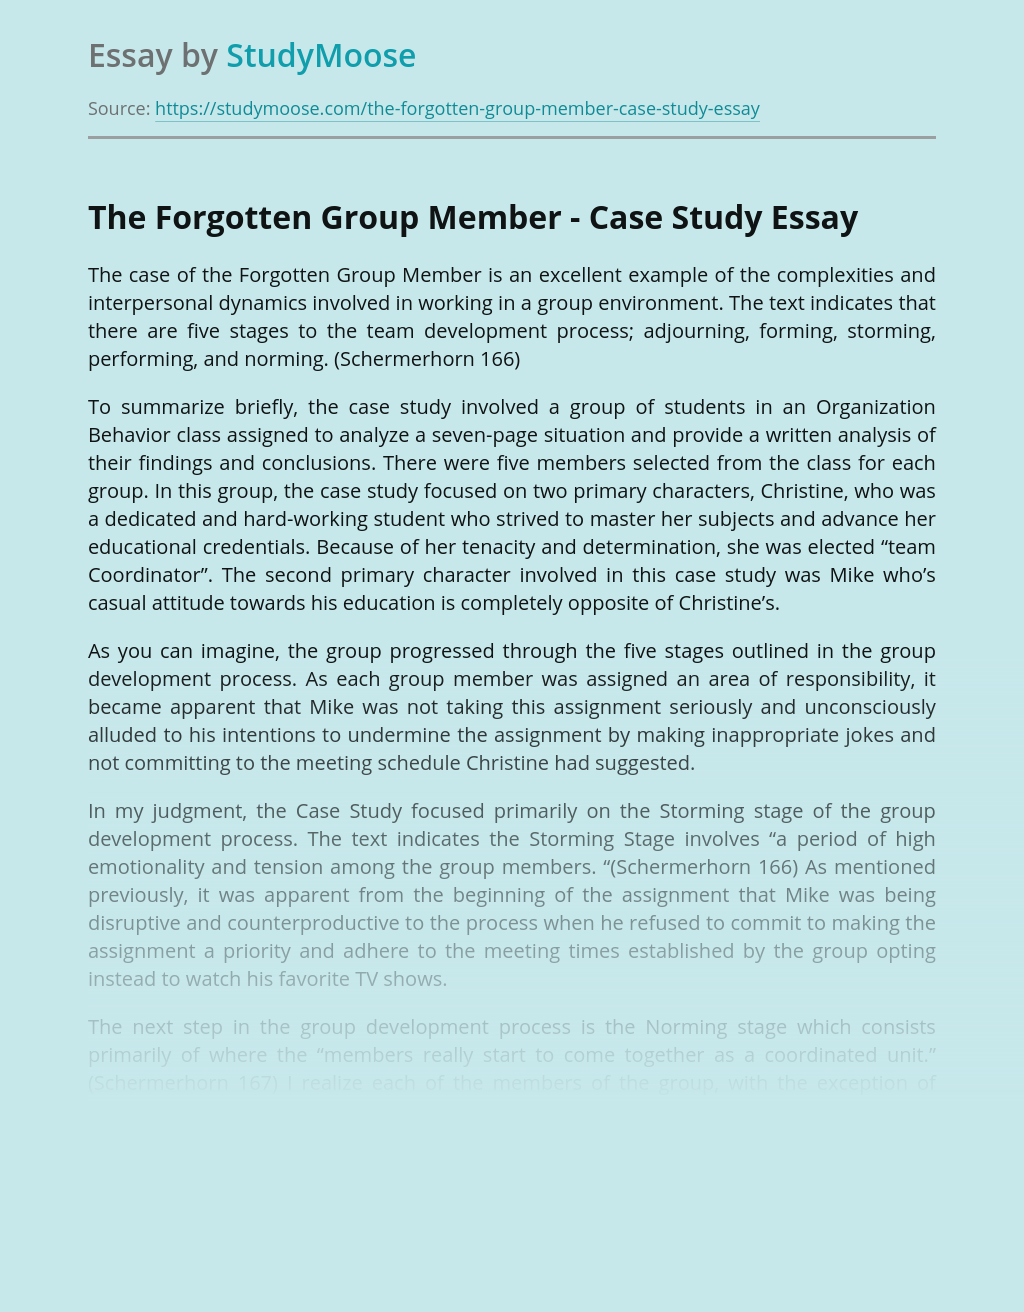 The Forgotten Group Member - Case Study